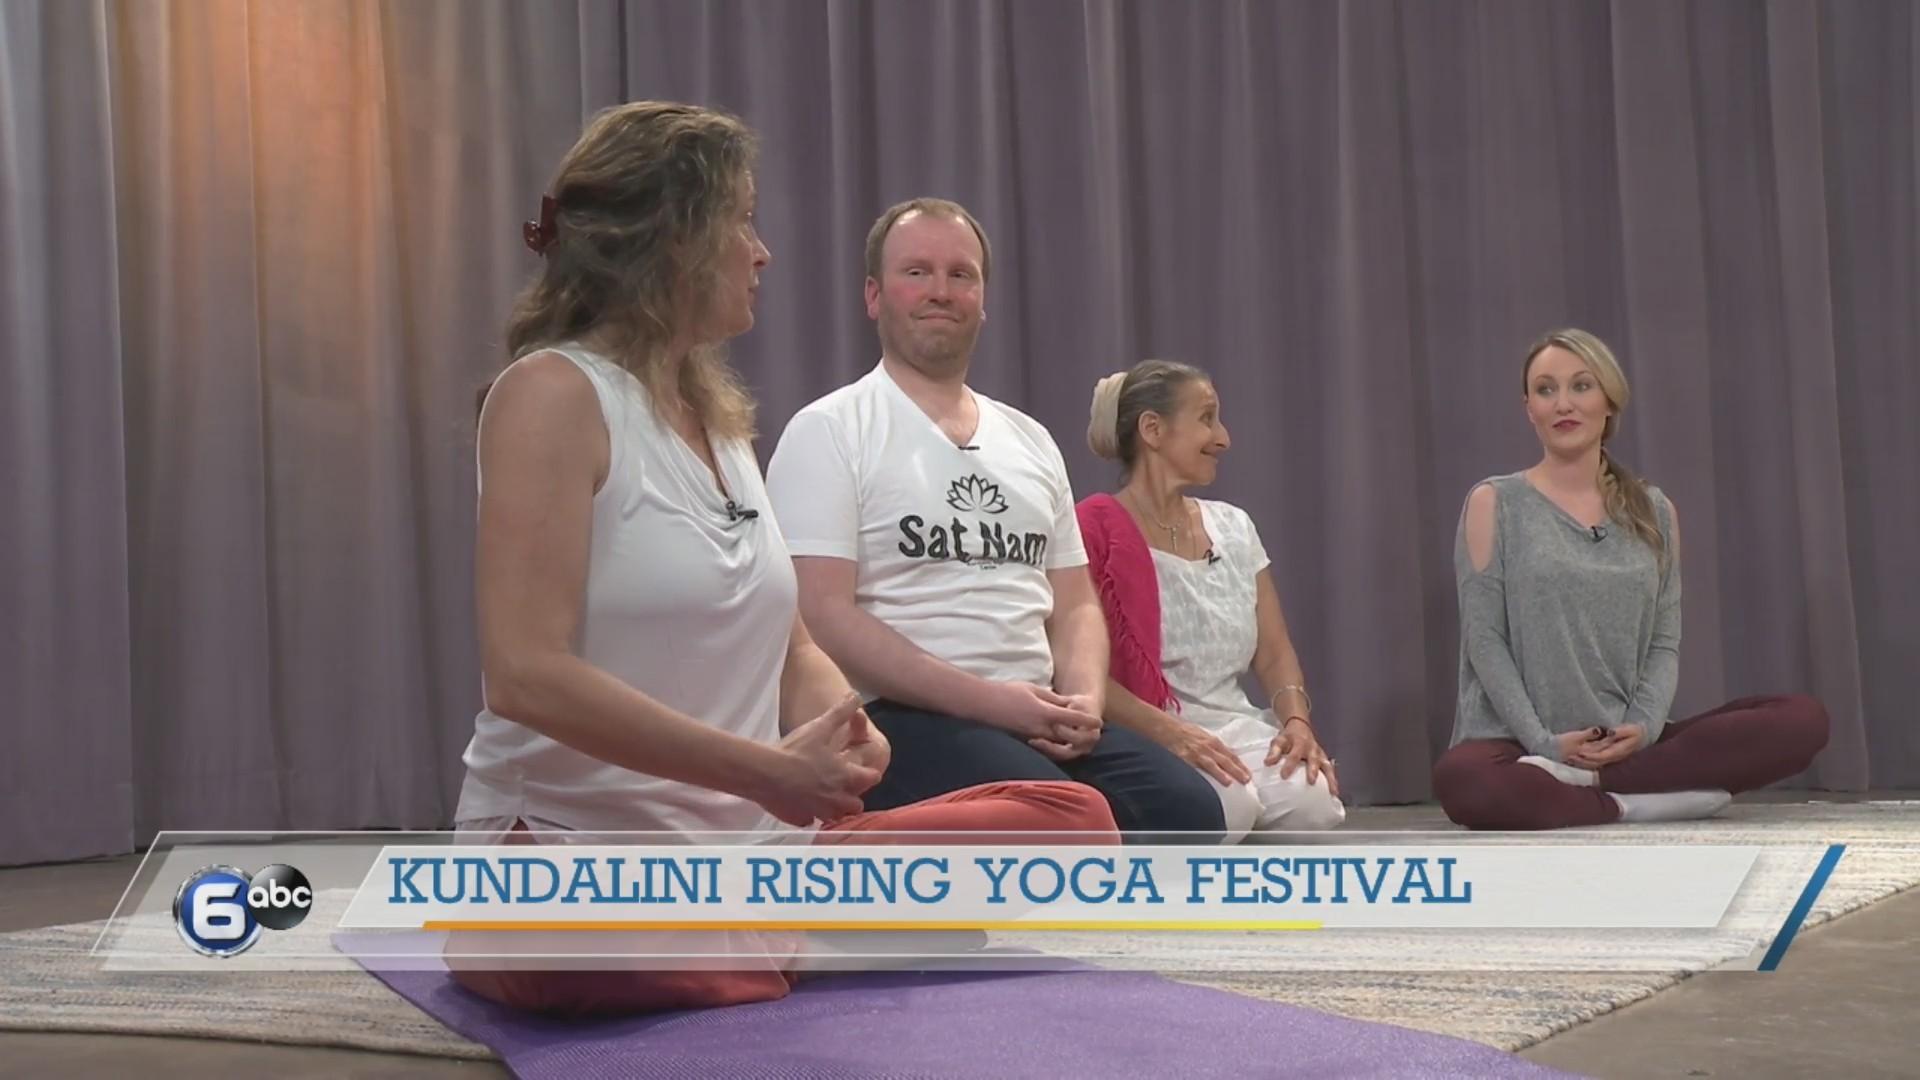 Kundalini Rising Yoga Festival - practice flow